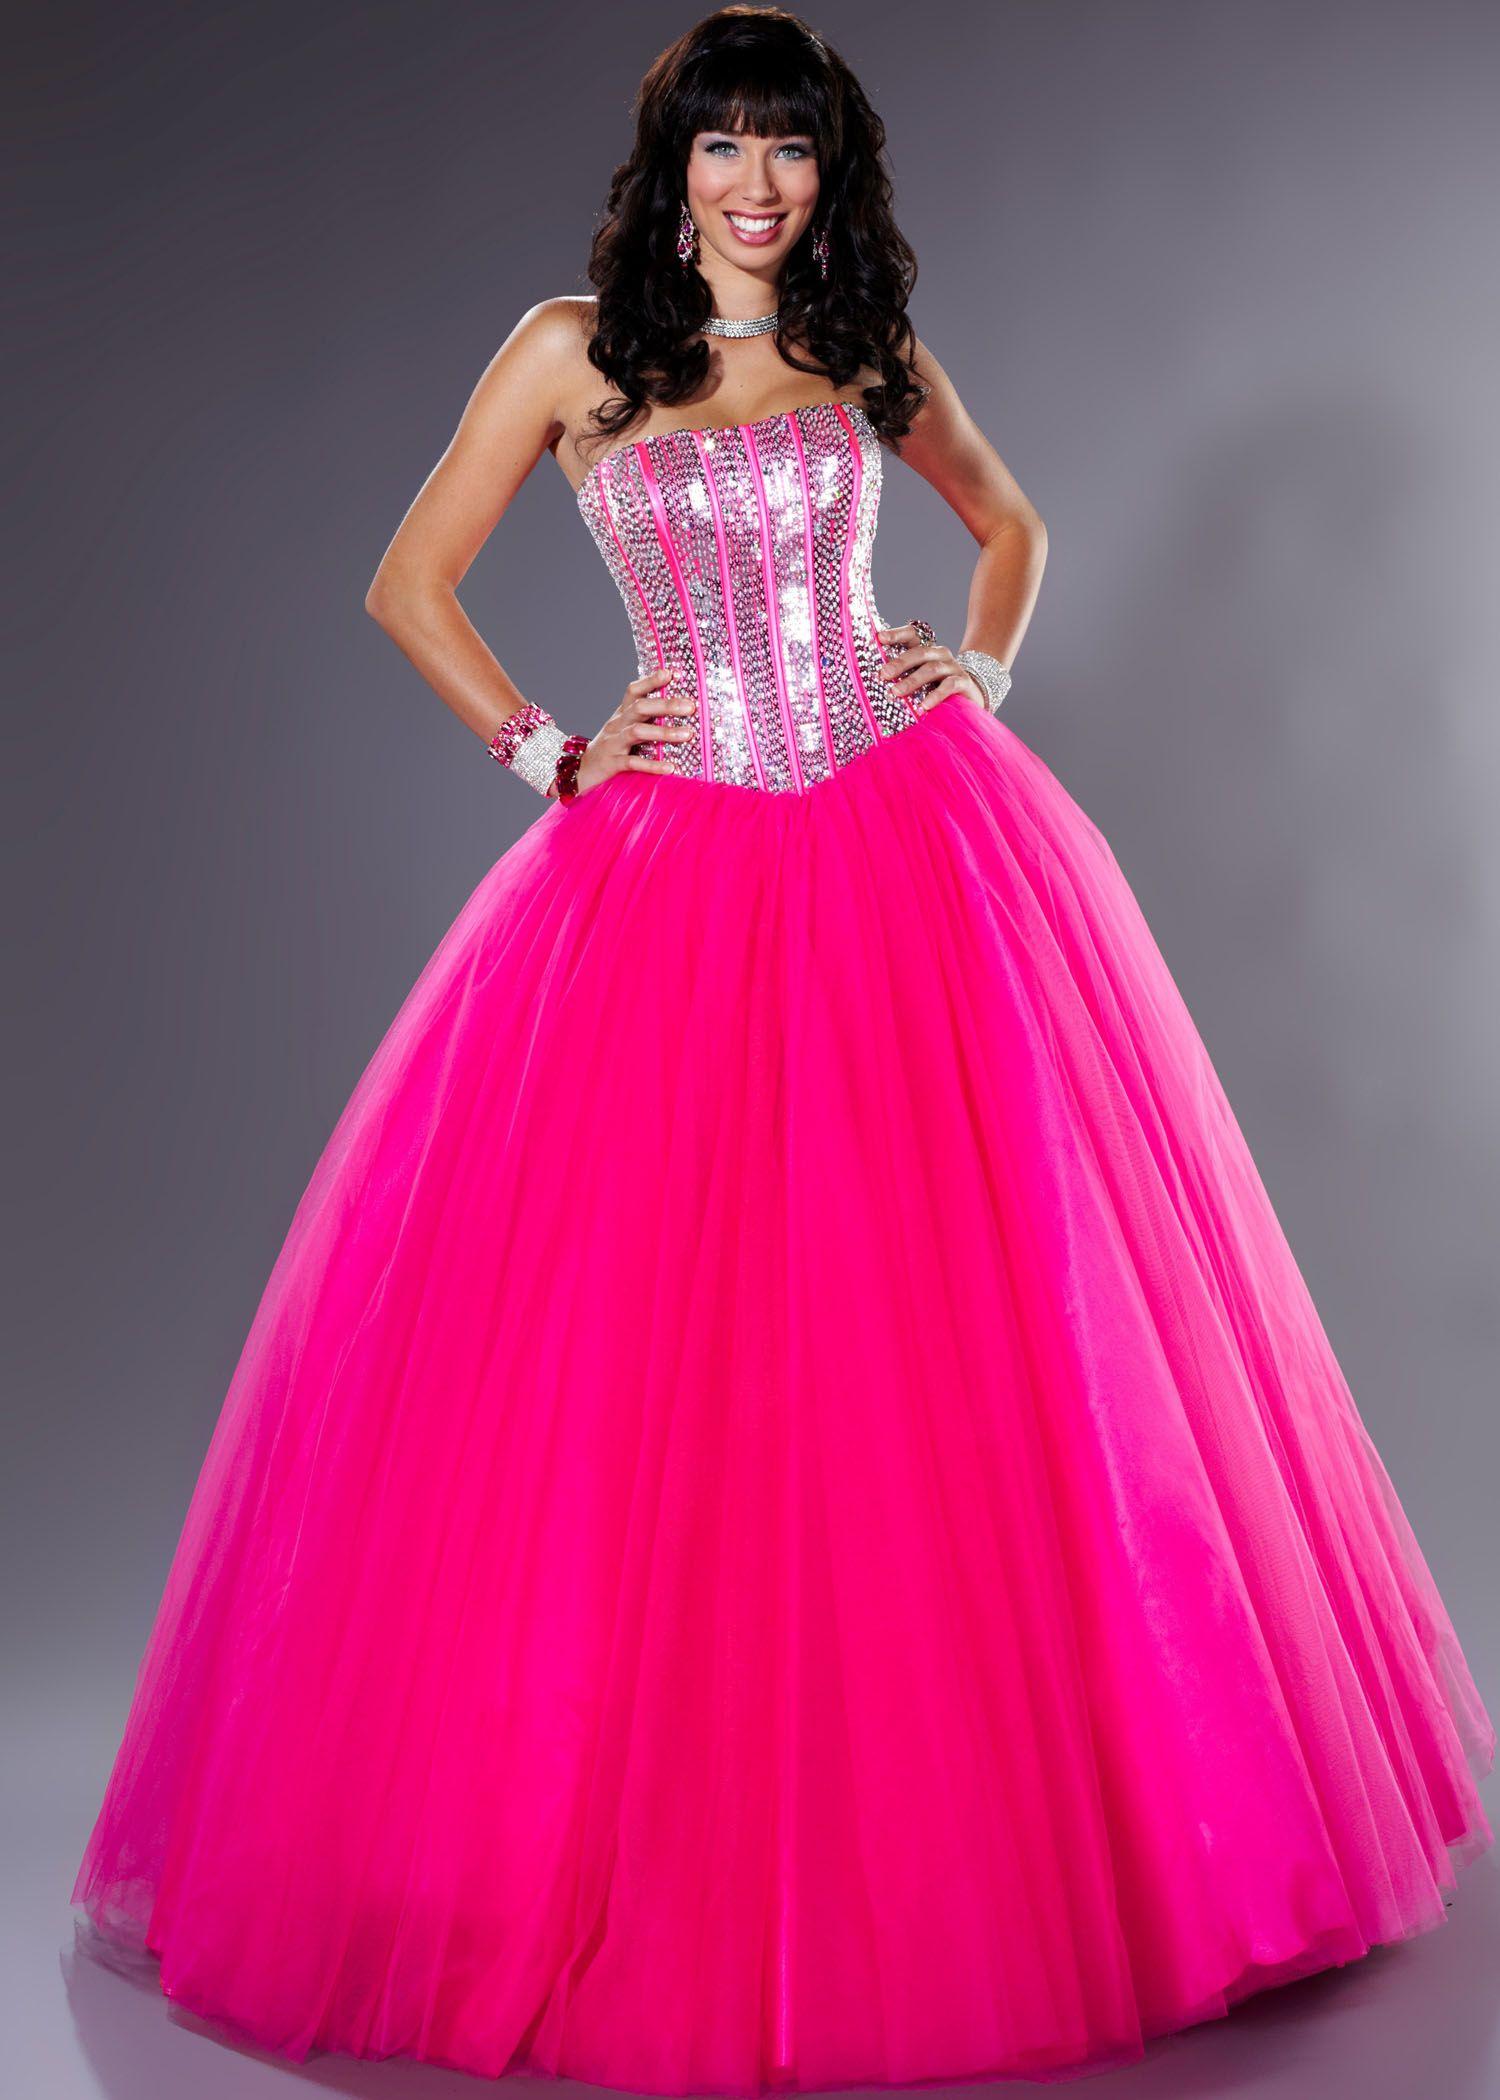 Lujo Vestidos De Fiesta En Gainesville Fl Ideas Ornamento ...